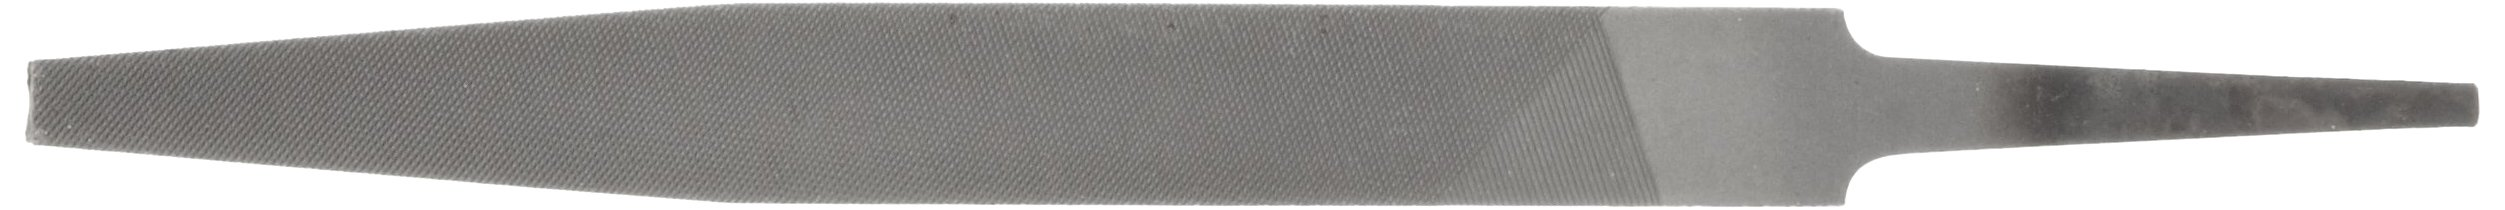 PFERD Flat Hand File, American Pattern, Double Cut, Rectangular, Medium, 12'' Length, 1-5/32'' Width, 9/32'' Thickness